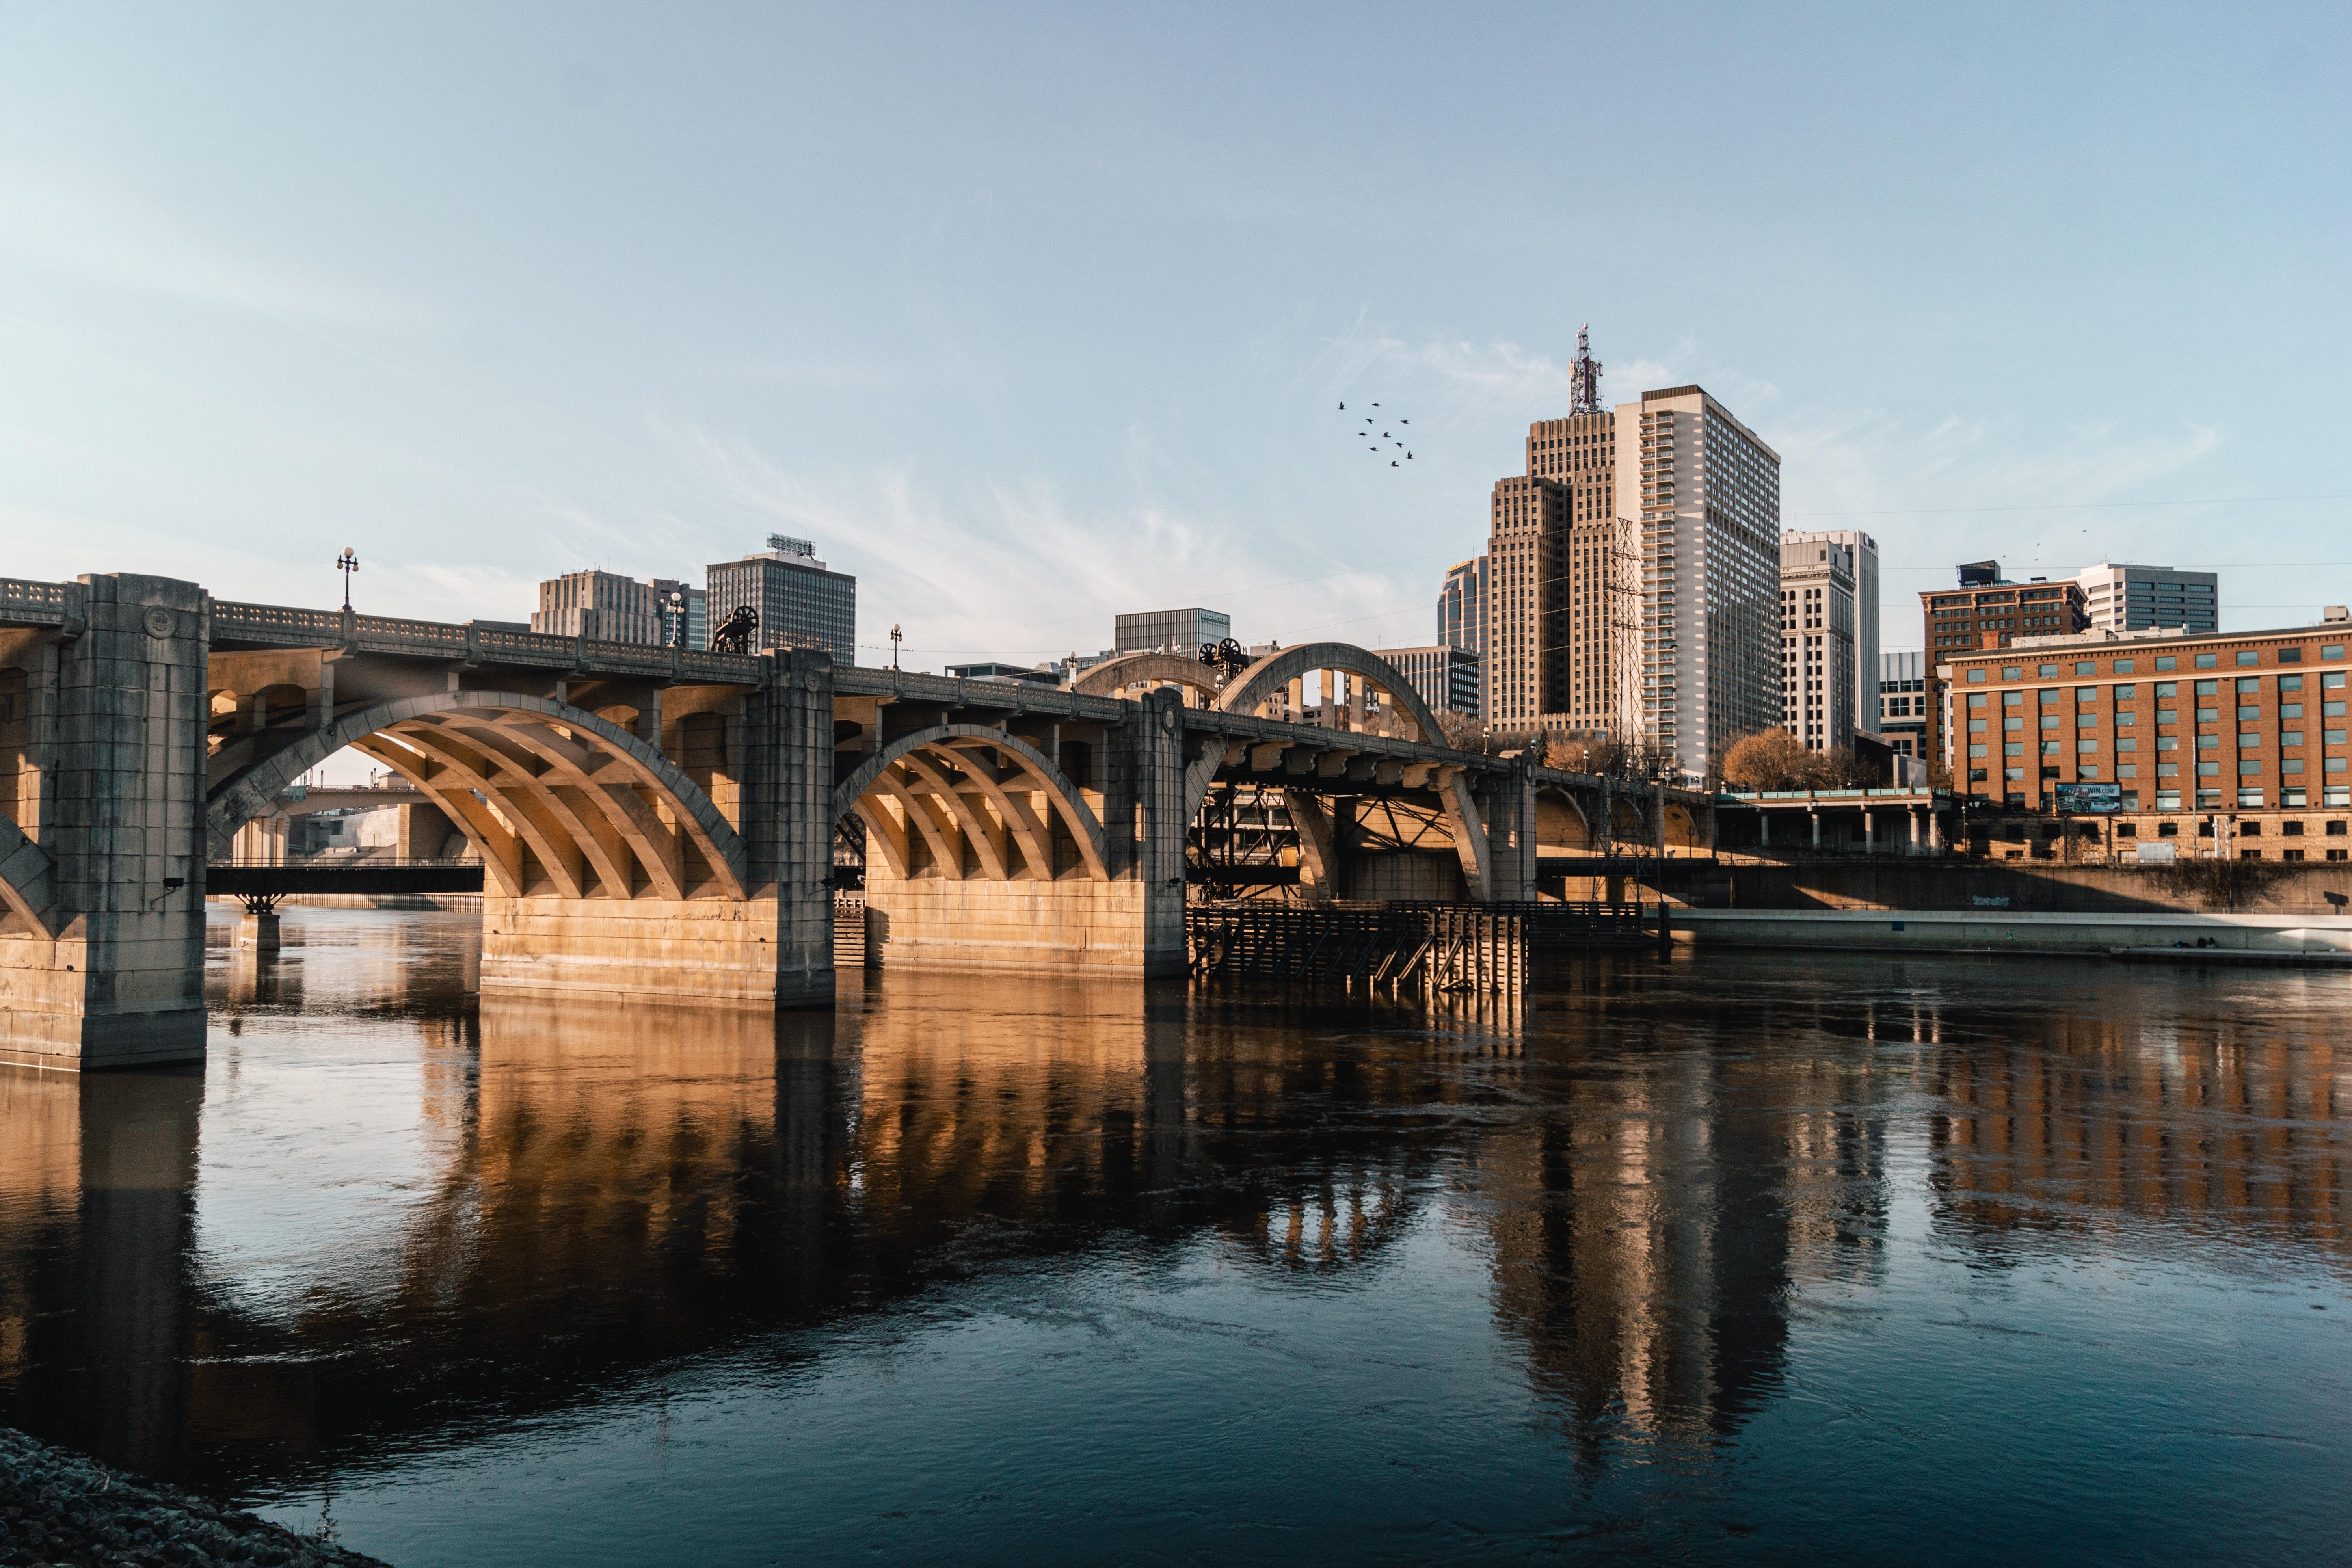 St. Paul Lift Bridge